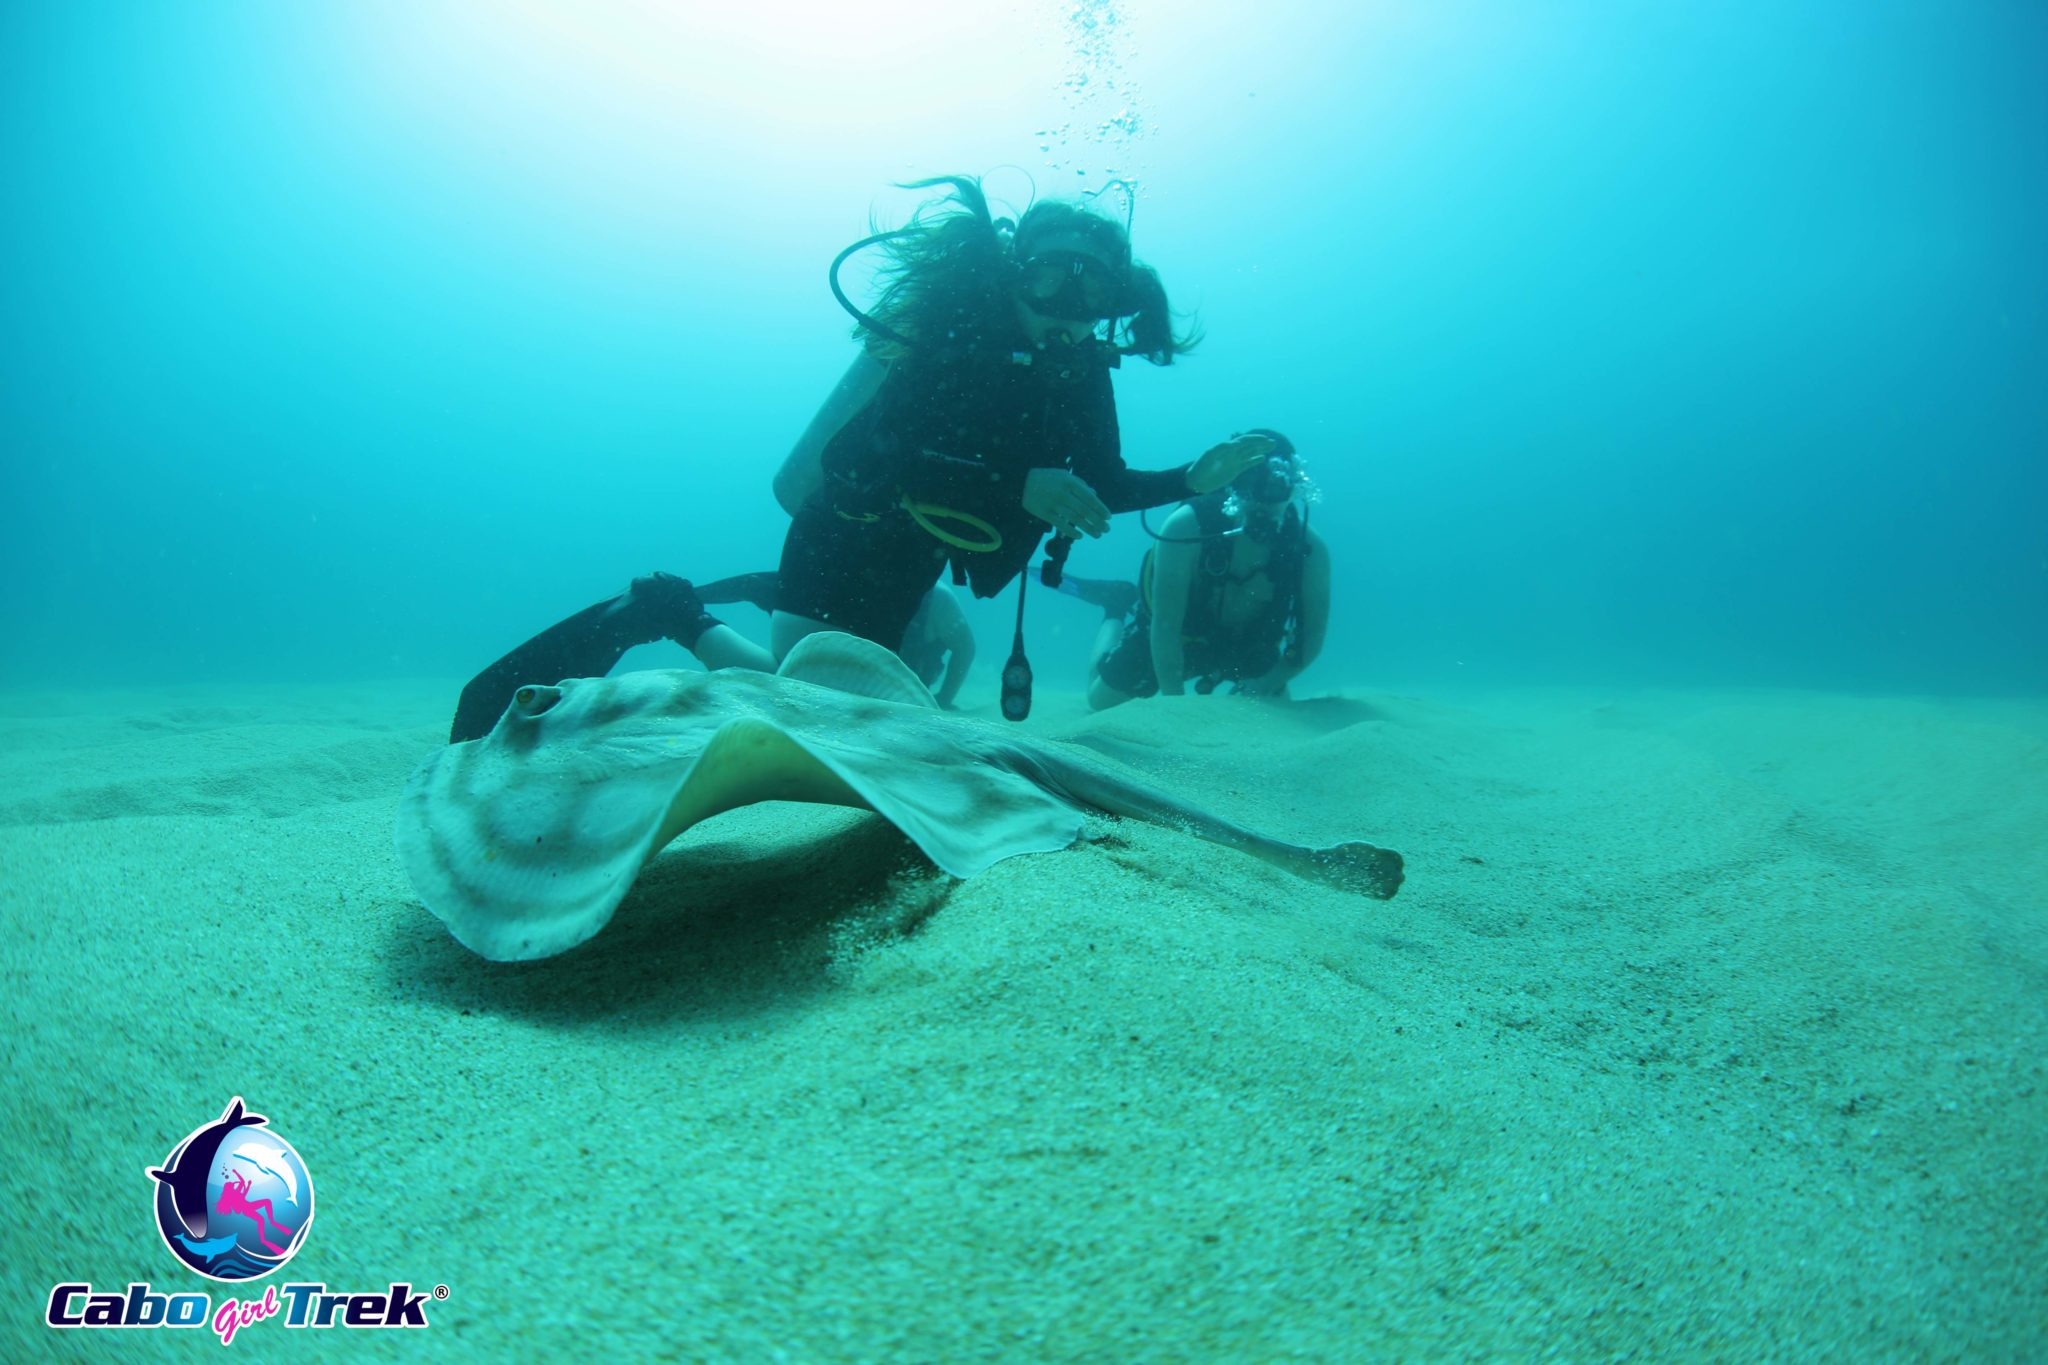 cabo scuba diving girls -4